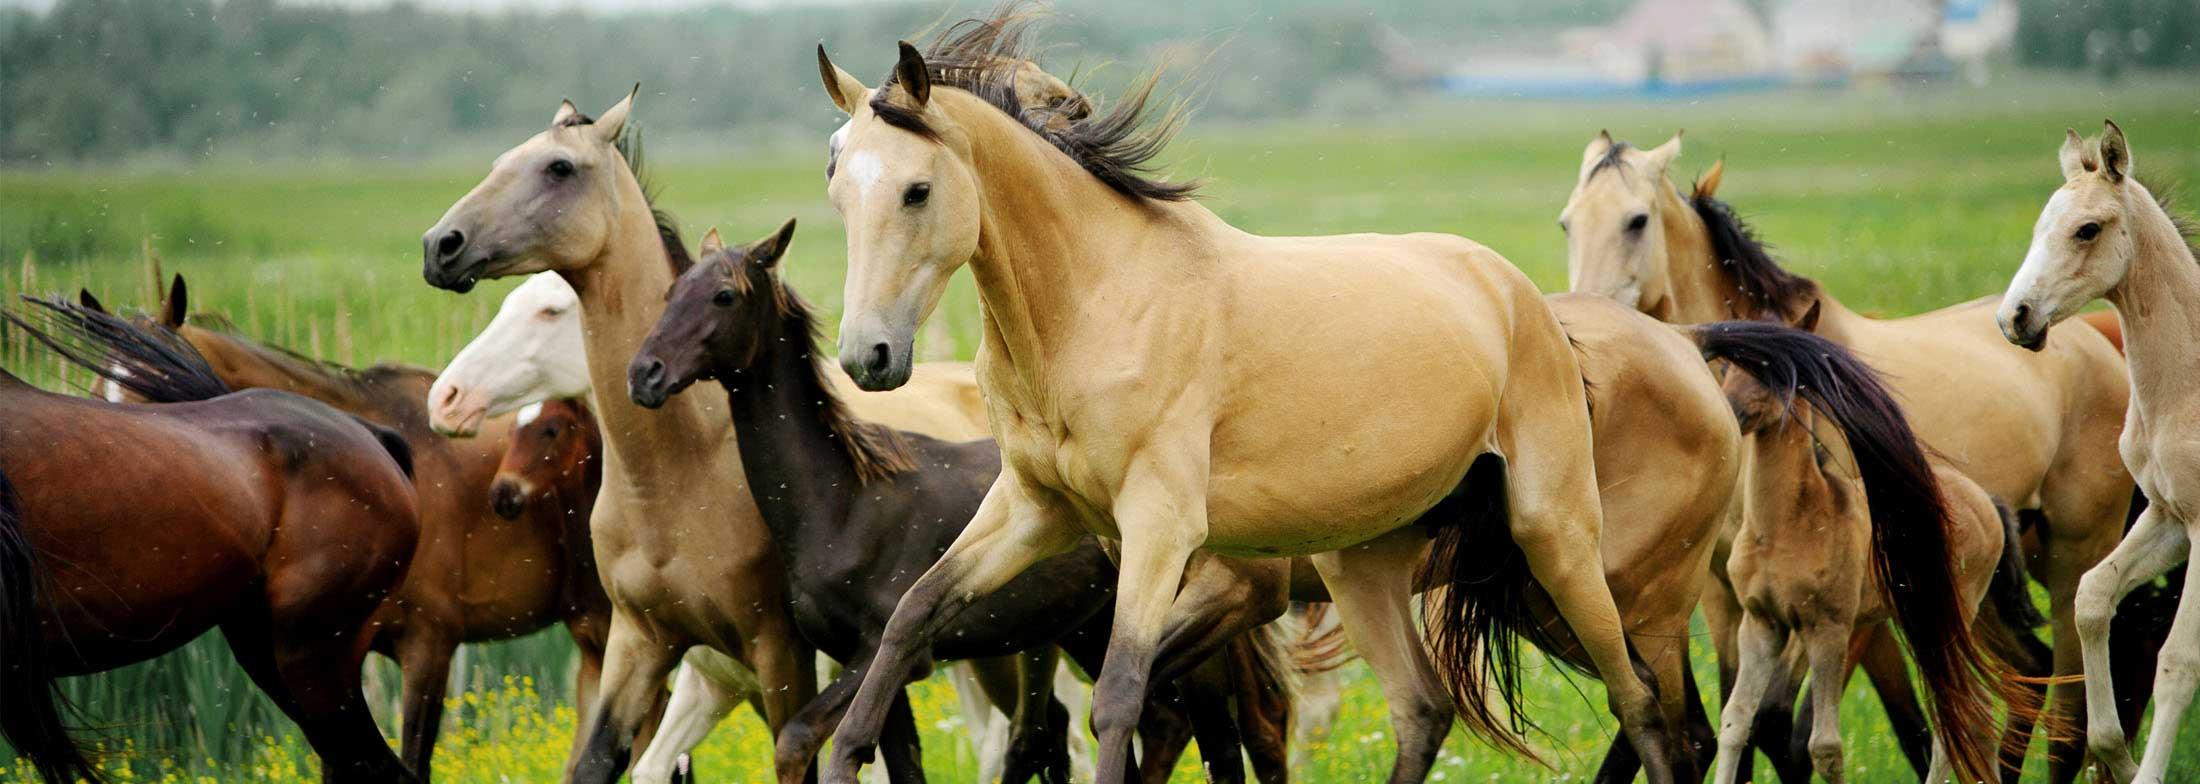 equineslider1-1